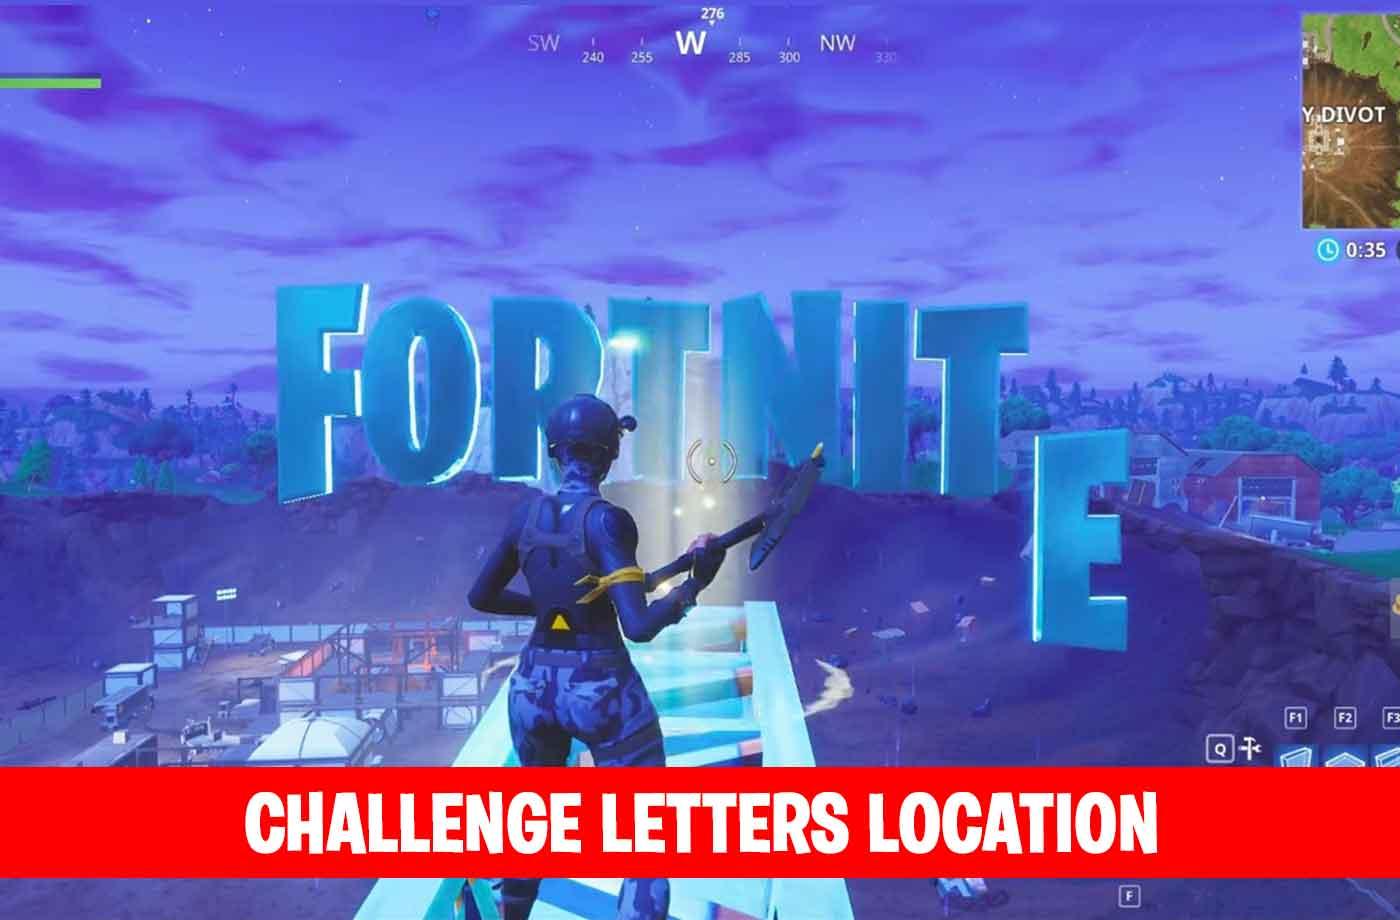 Fortnite Challenge Season 4 Letters Location F O R T N I T E Kill - fortnite challenge season 4 letters location f o r t n i t e